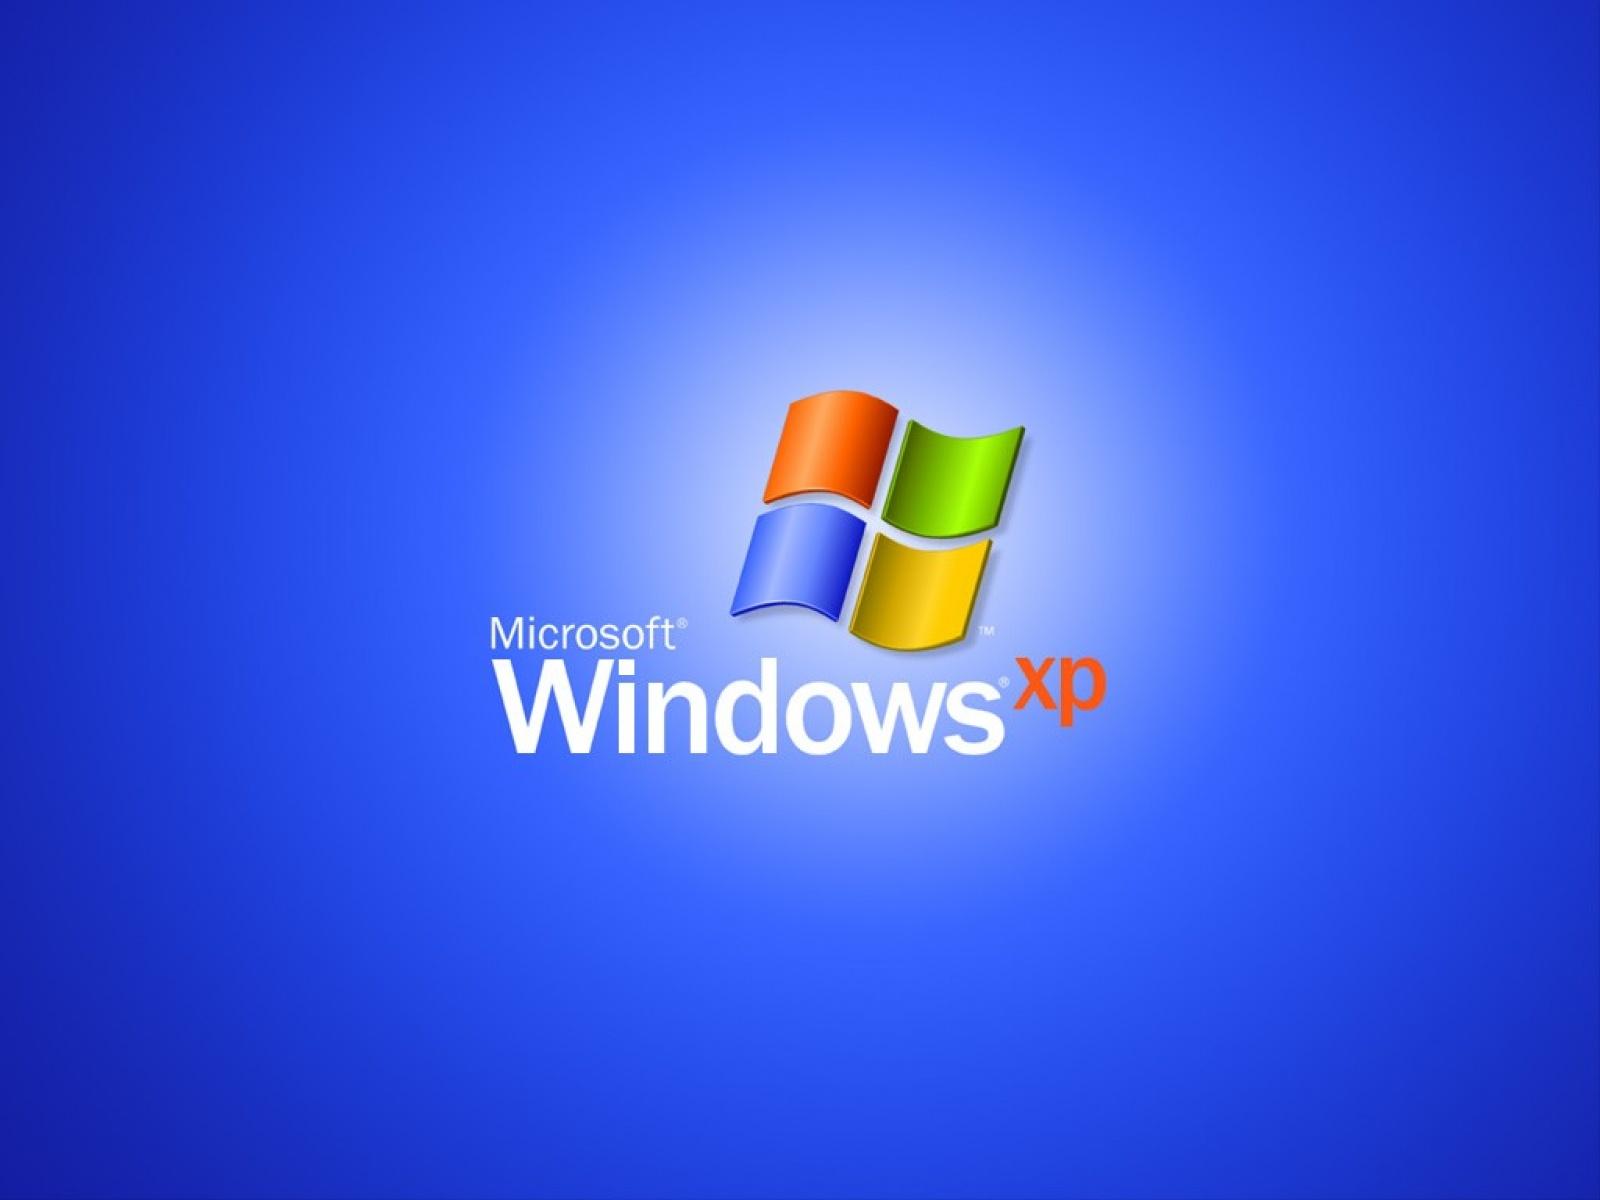 windows xp logo wallpaper wallpapersafari